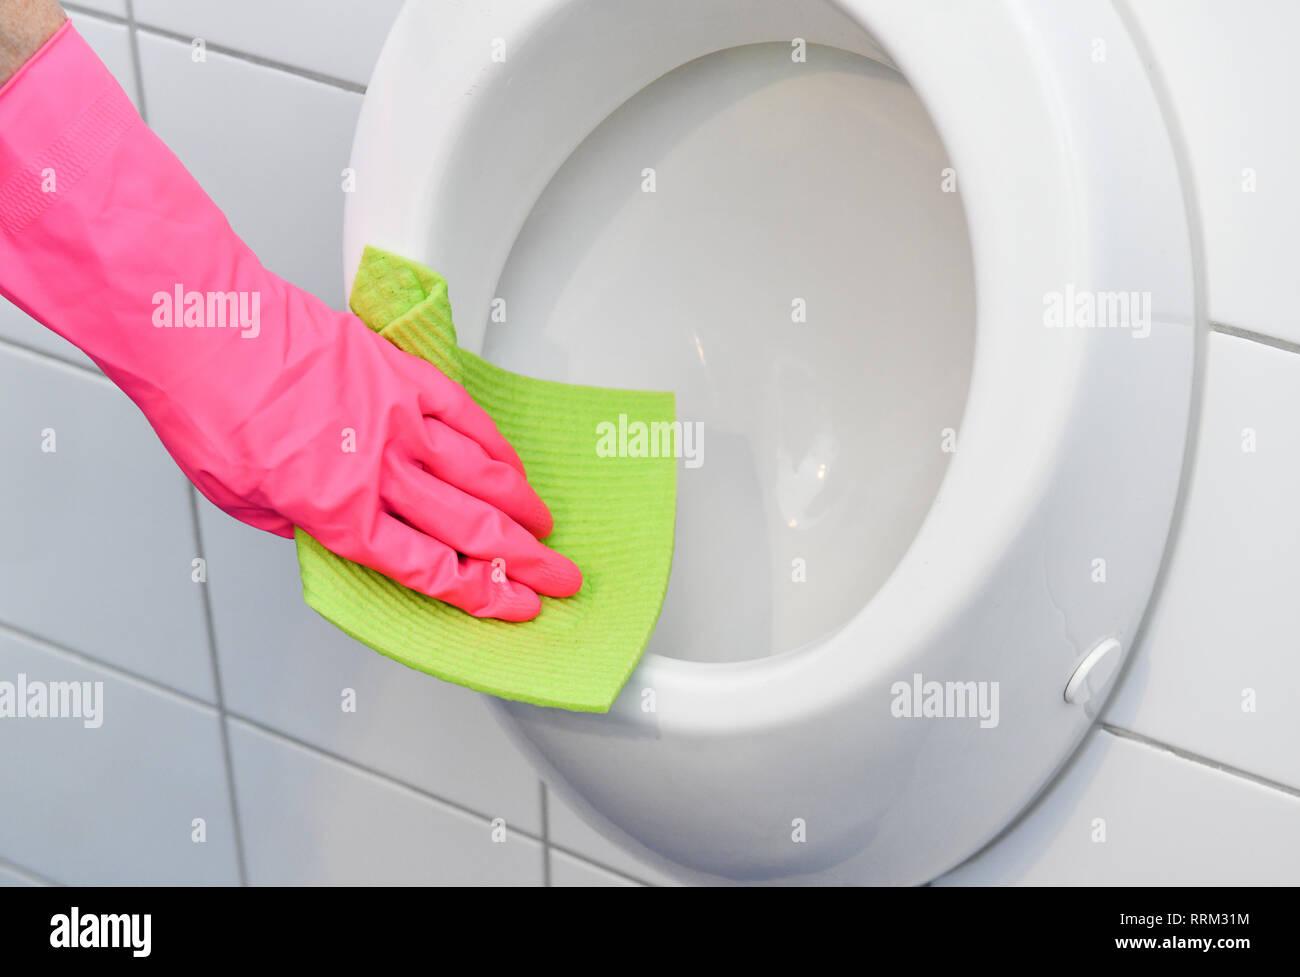 Cleaning, bathroom, Urinal, Reinigung, Badezimmer Stock Photo